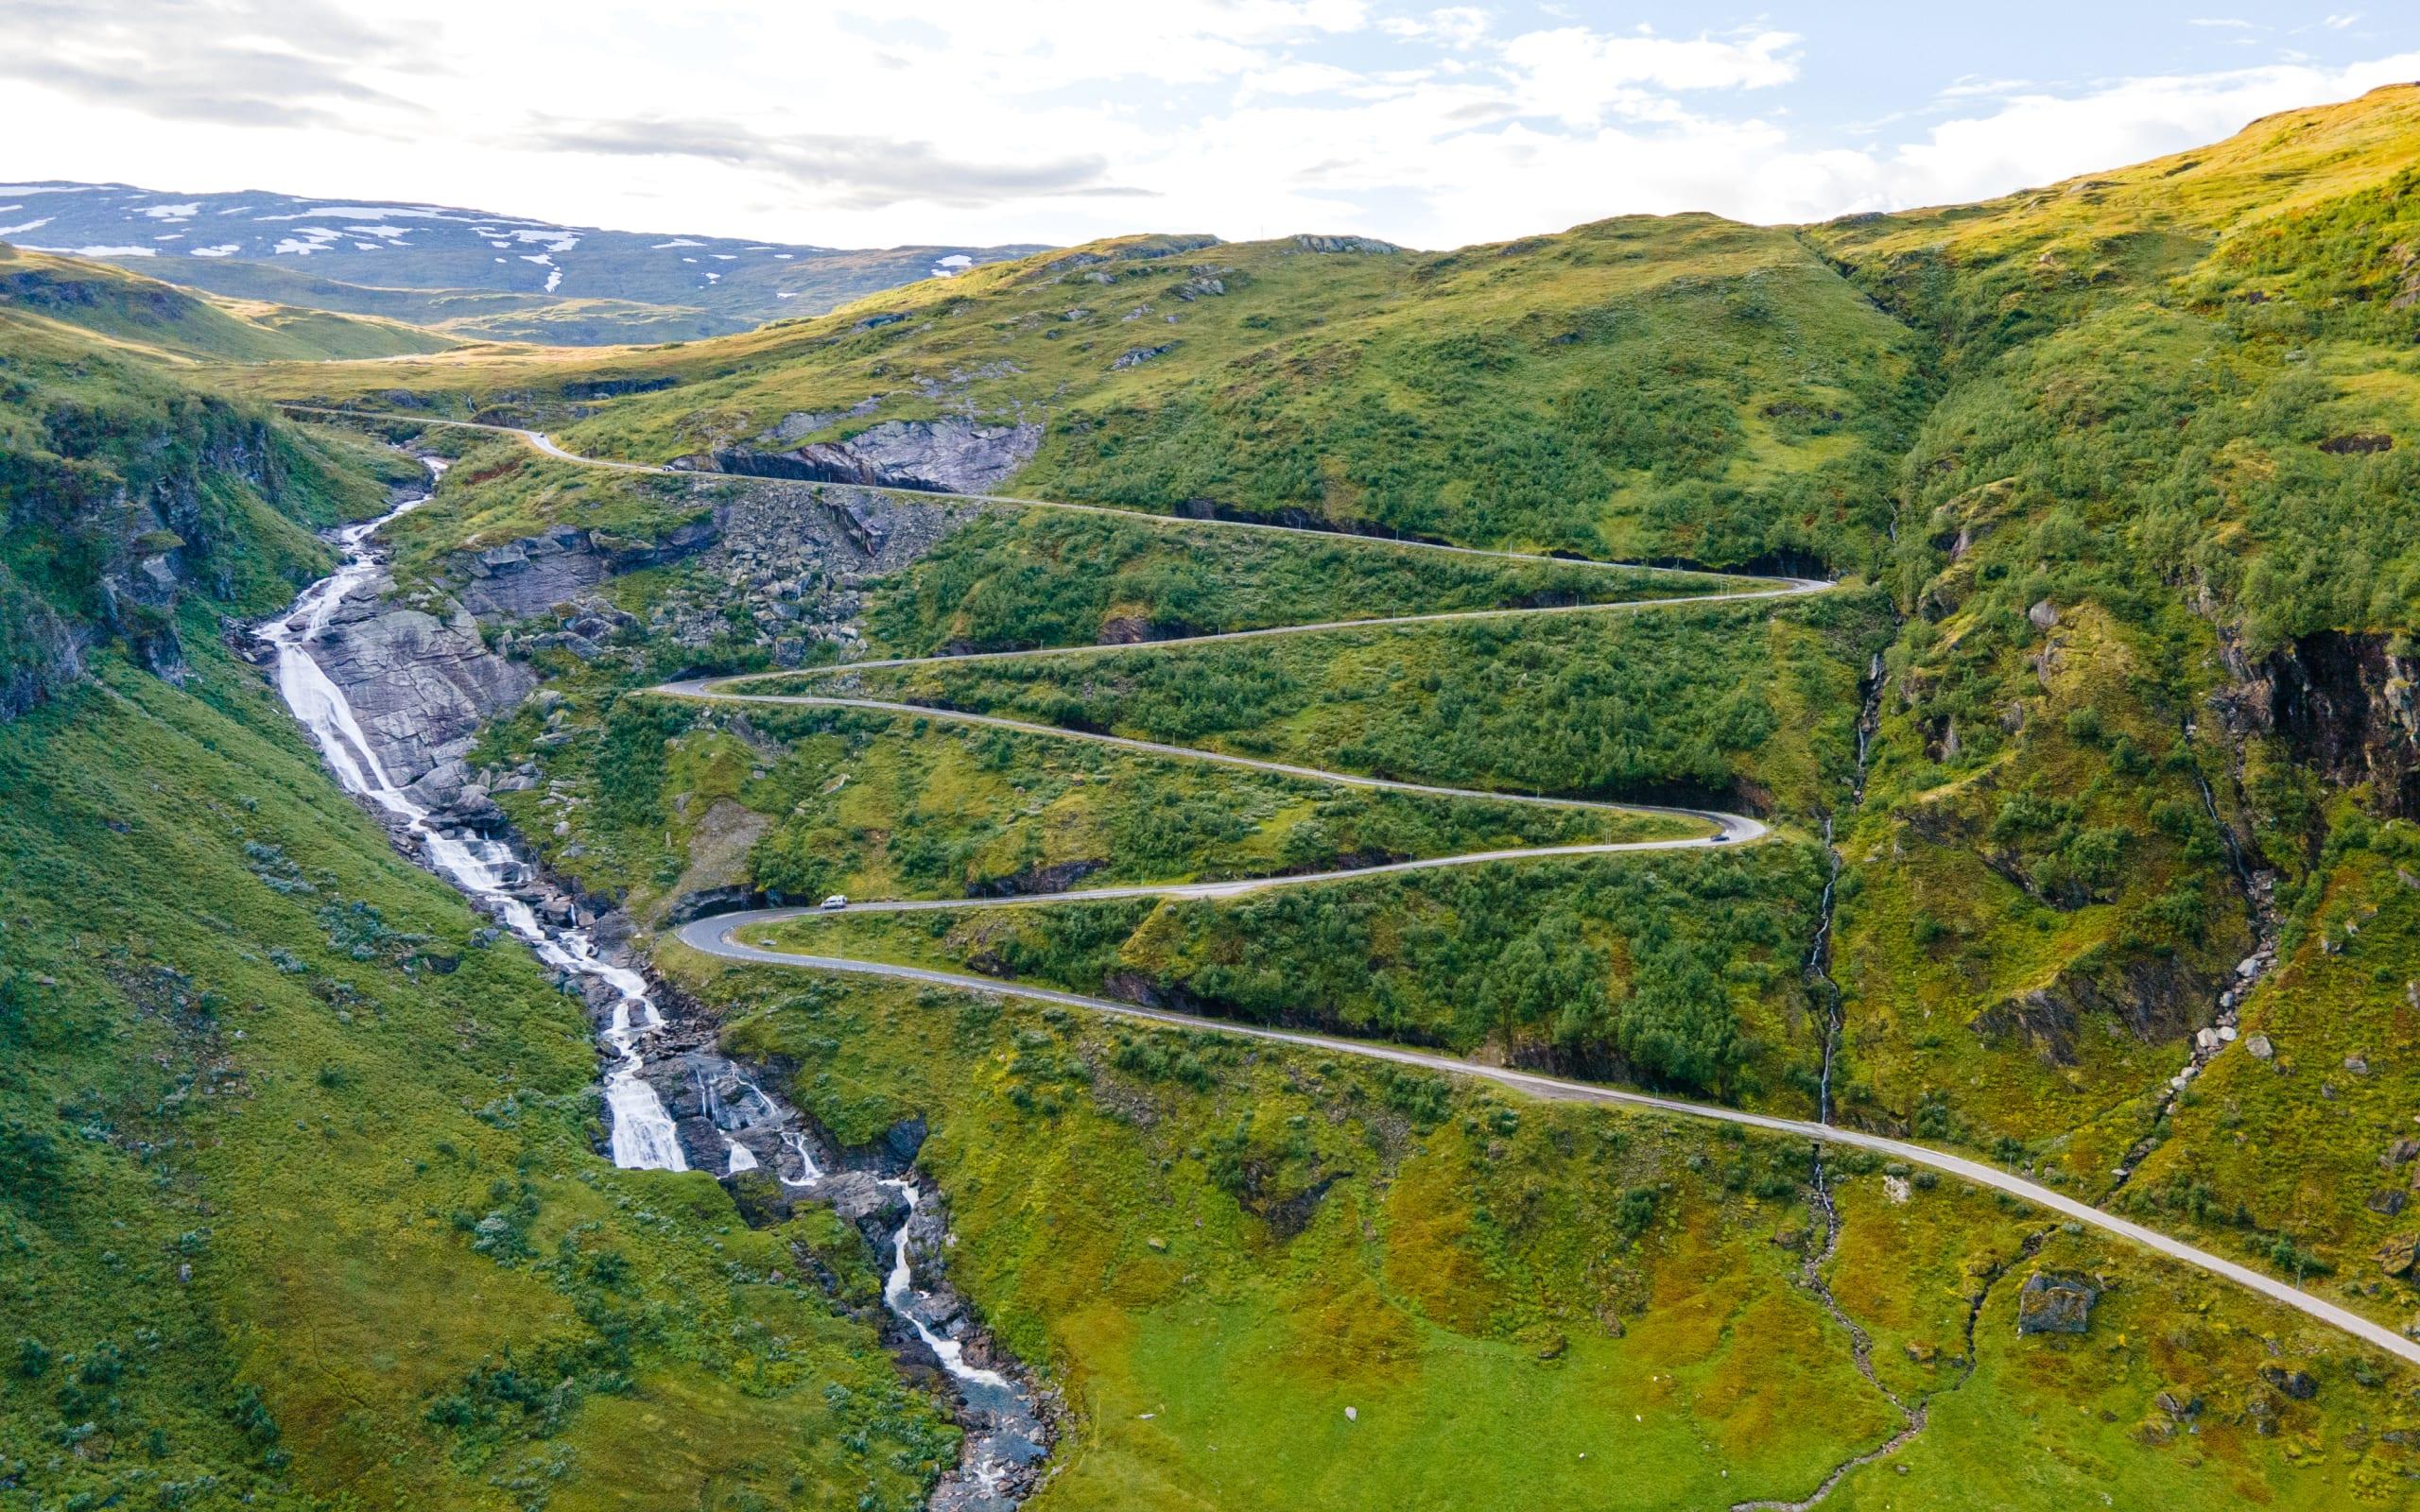 Winding road leading up to Vikafjell